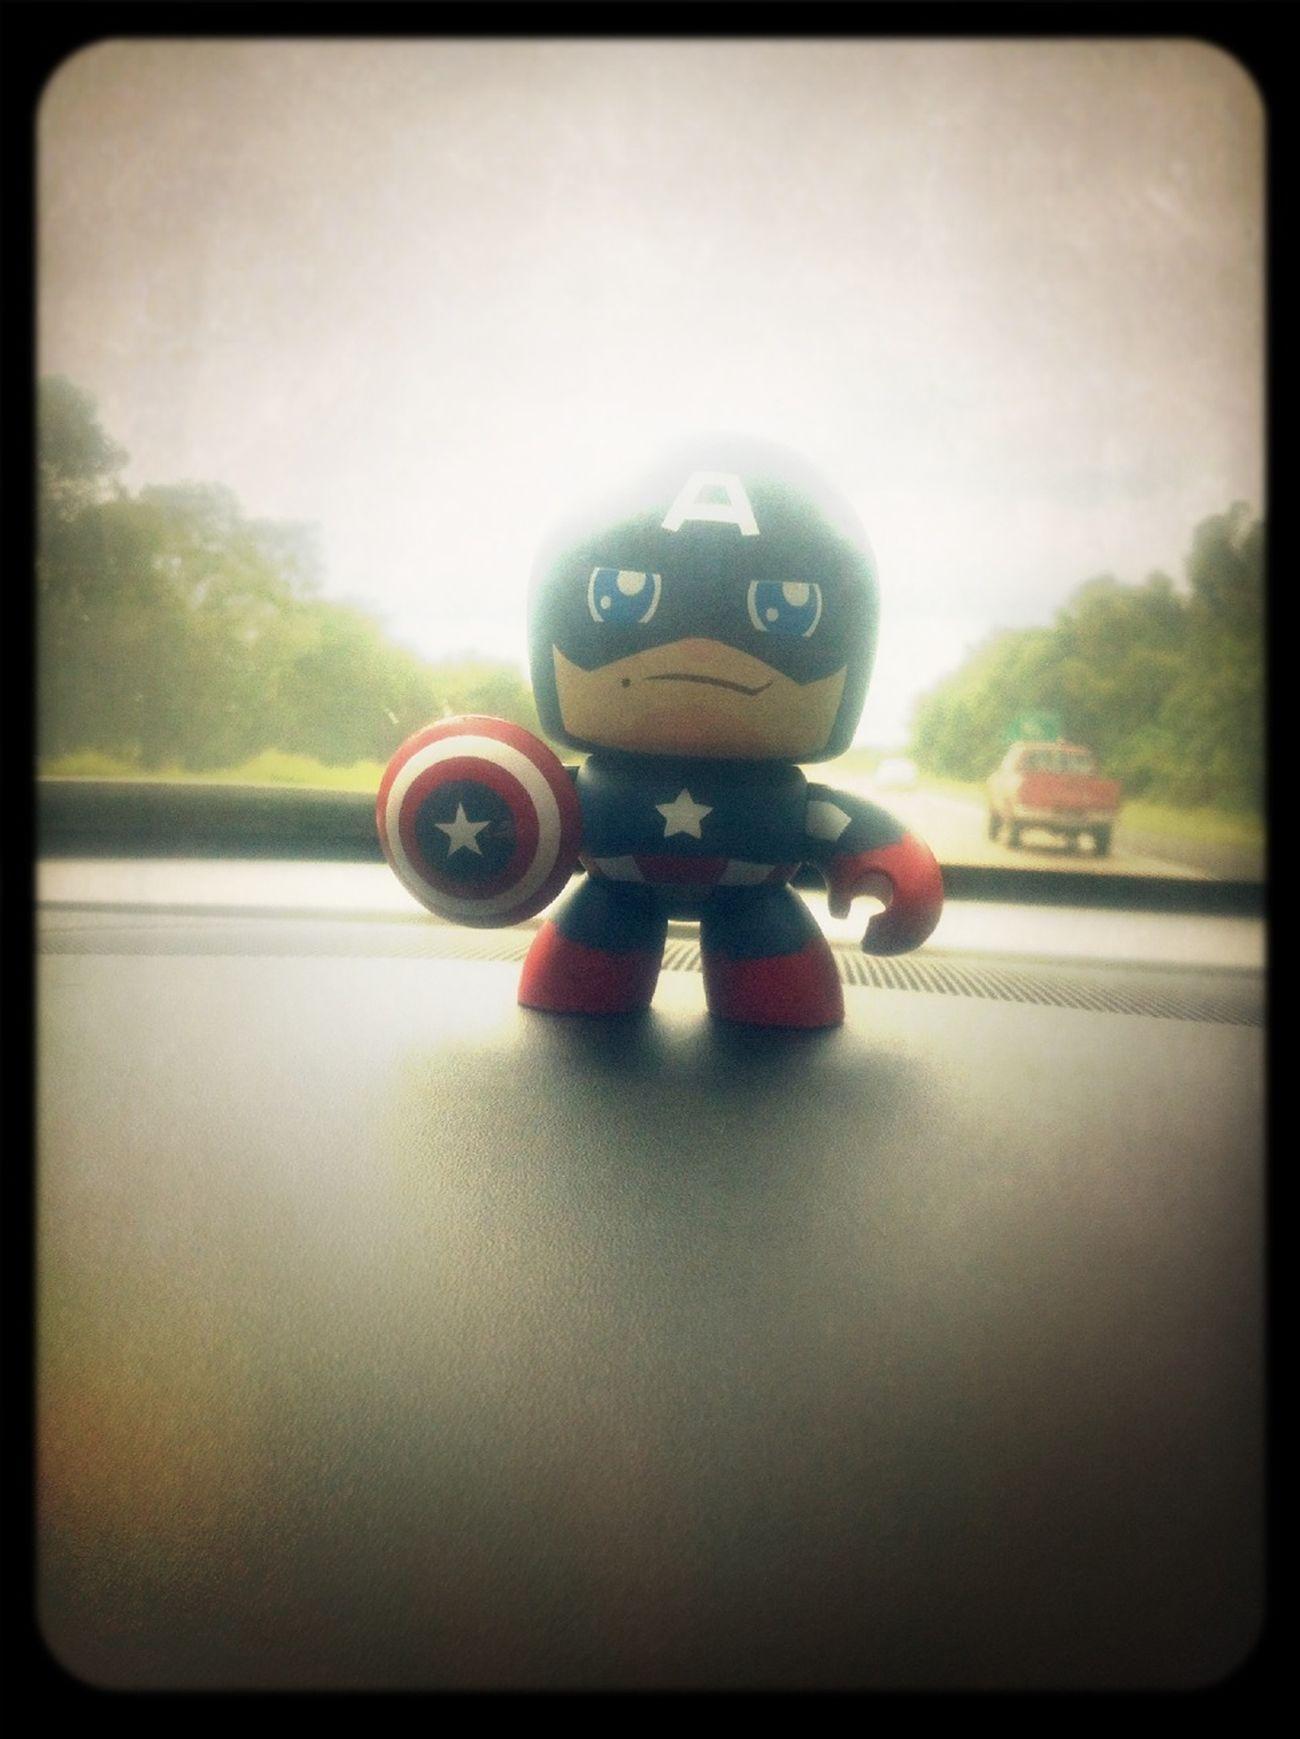 My New Co-pilot